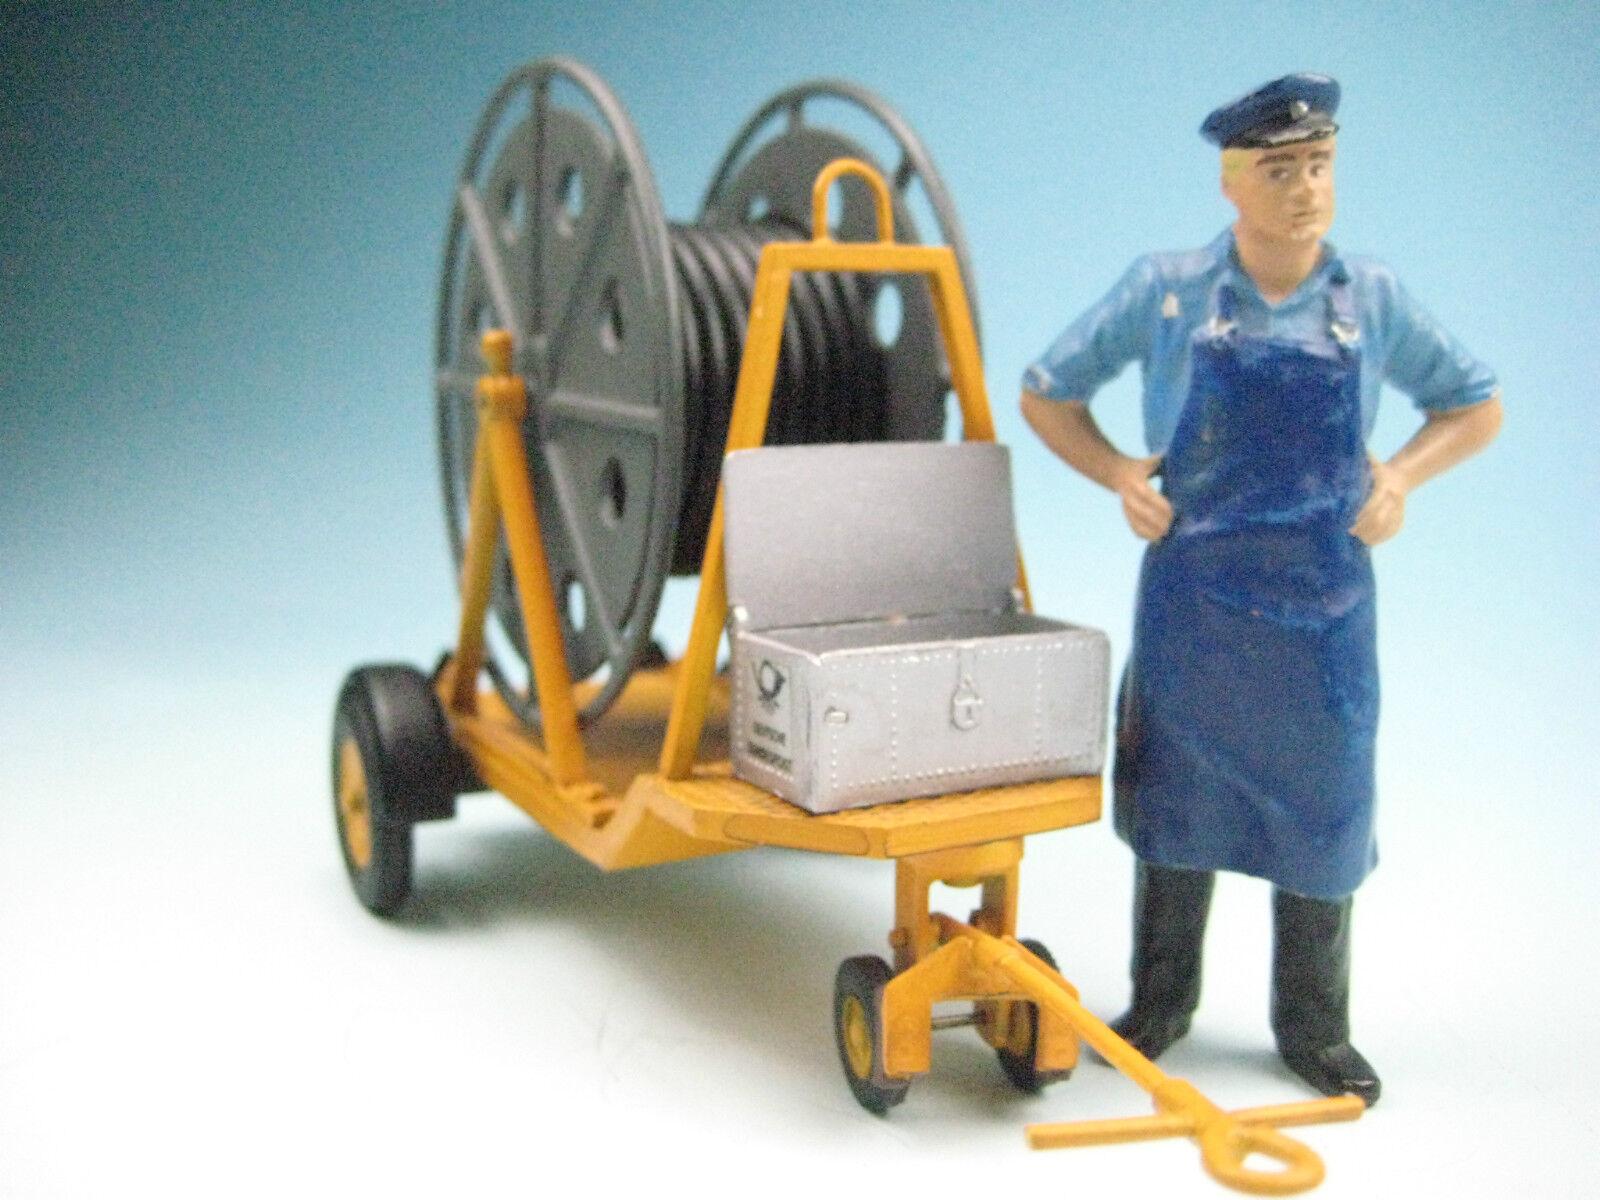 Mano modelo de trabajo  Cochero de cable kabelbauwagen  en escala 1 22,5 (85120 f)